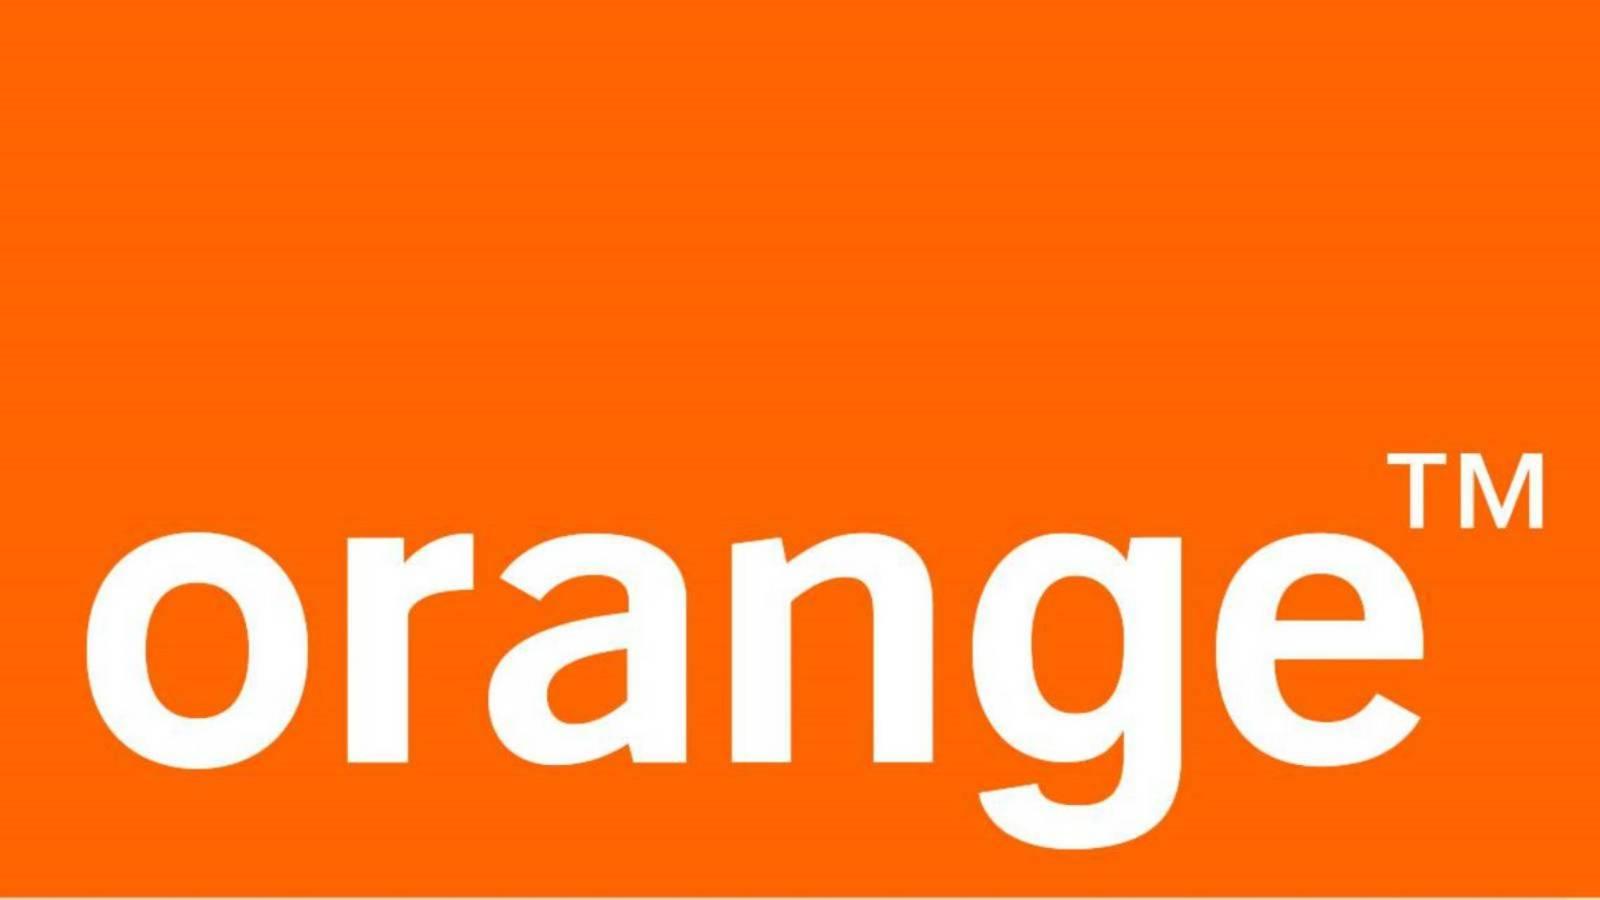 orange ursul